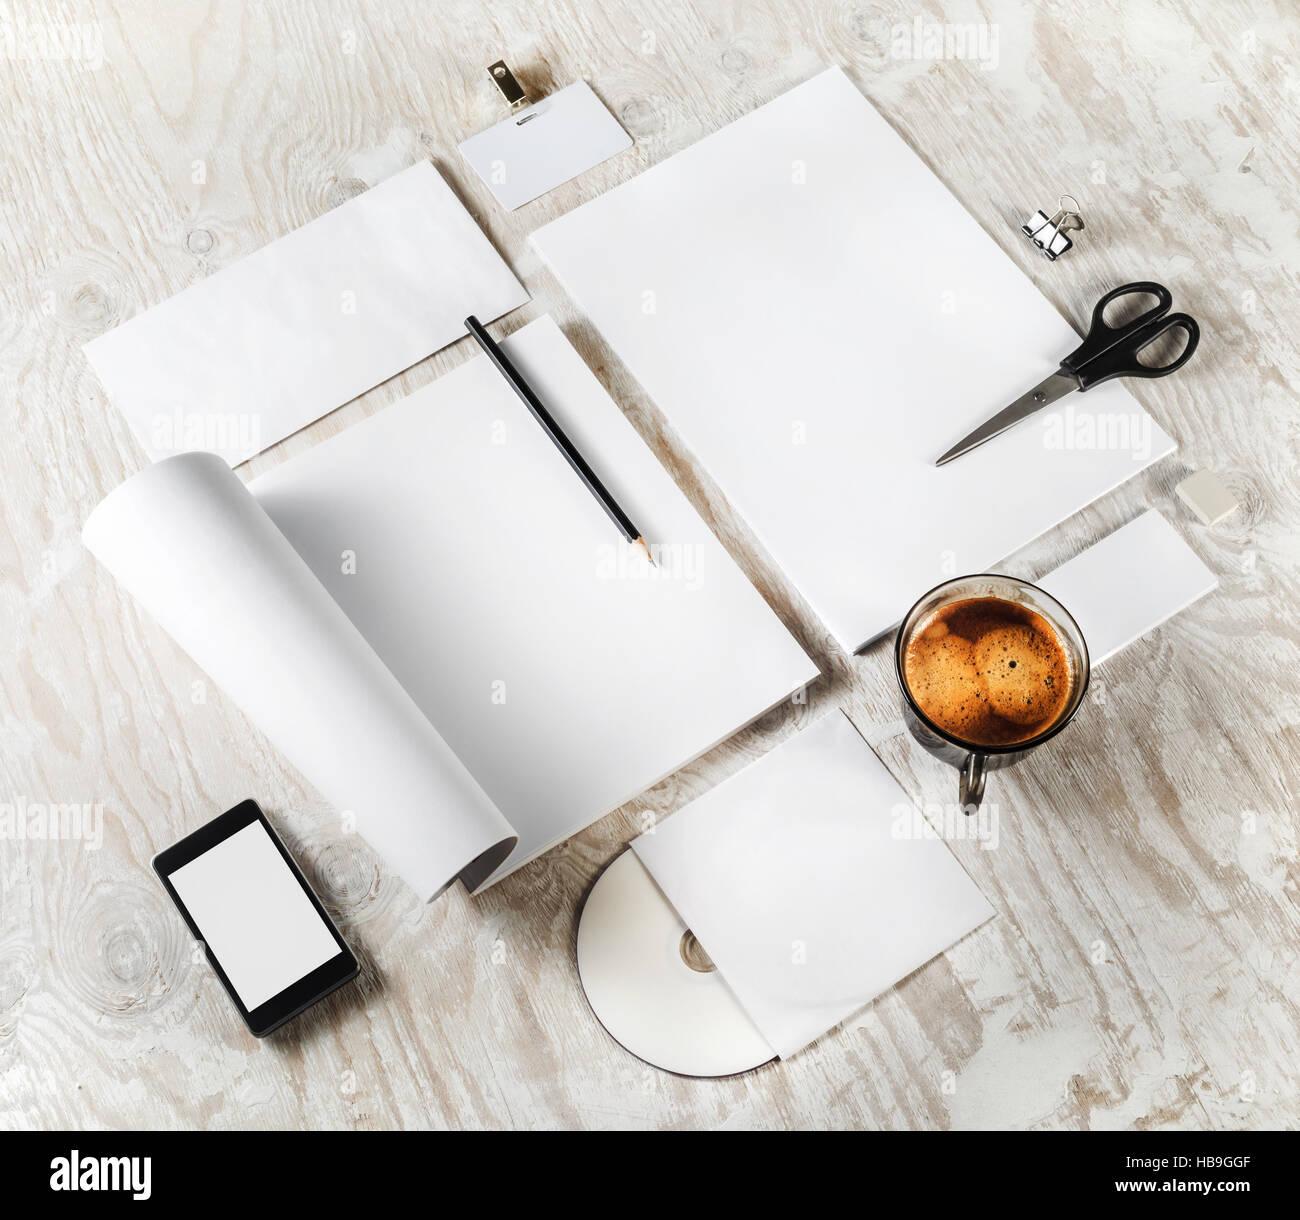 Blank branding identity - Stock Image